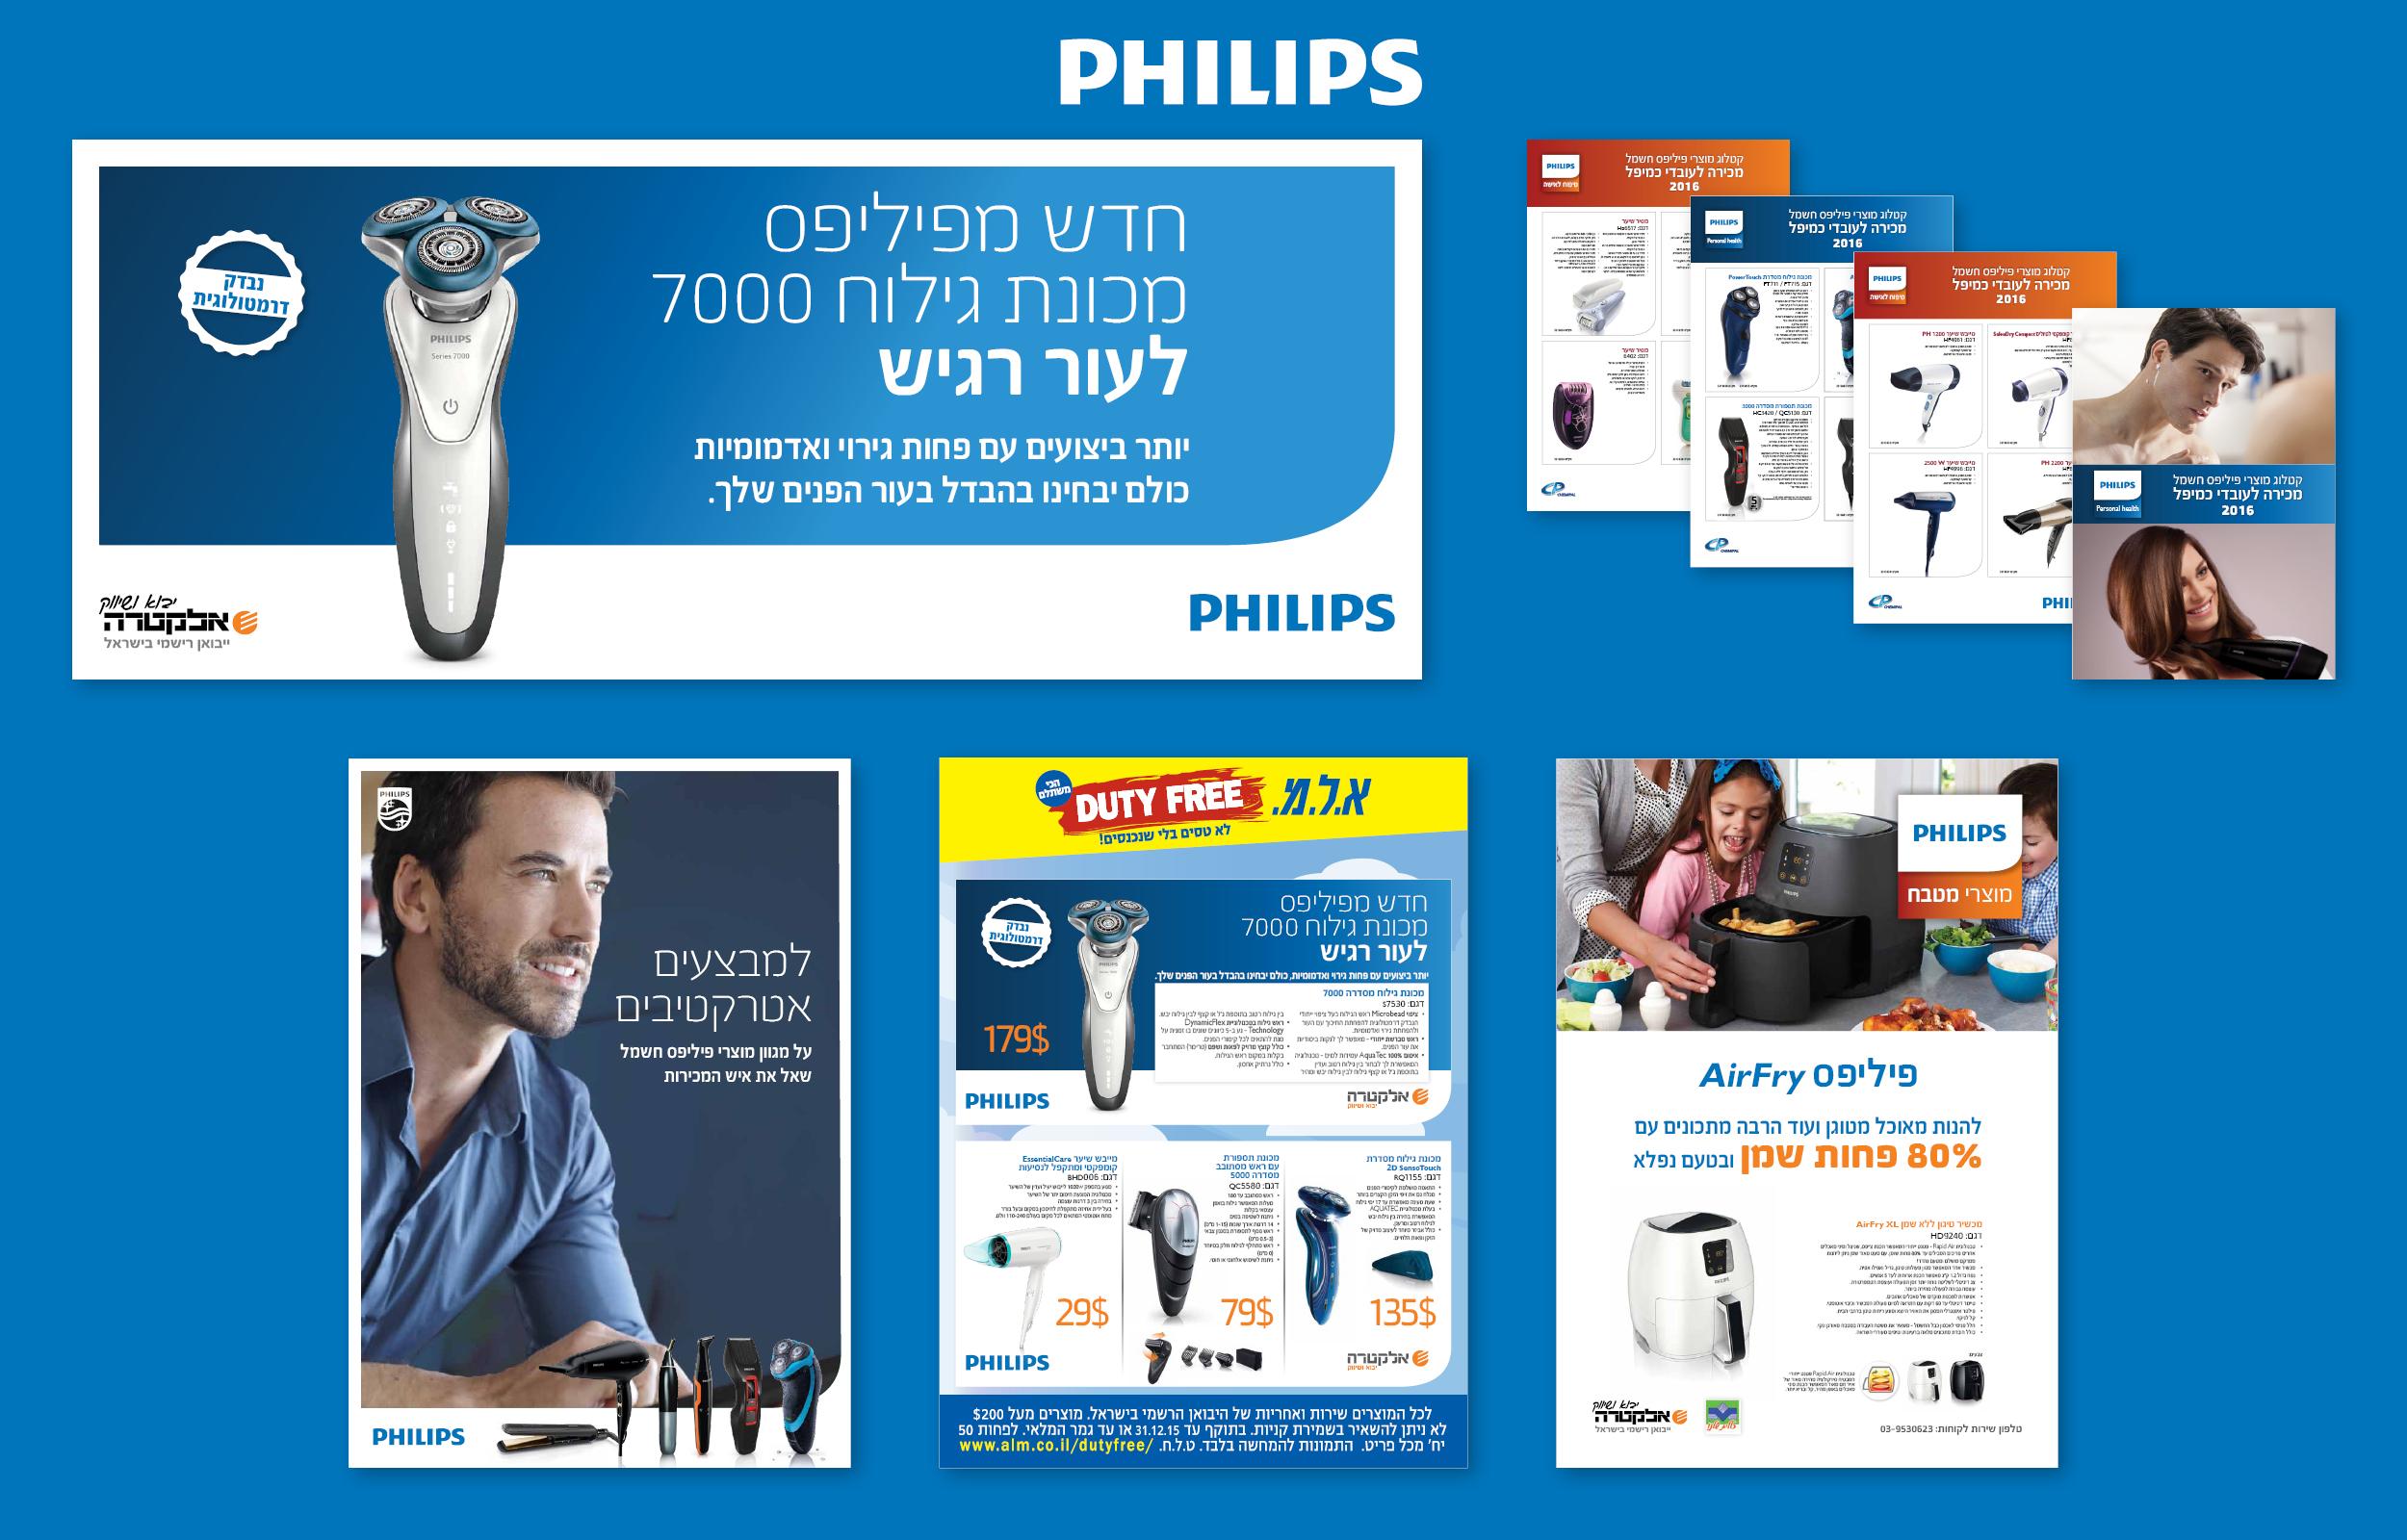 Shir Andrey PW 2016 2000x1280 Philips Modaot